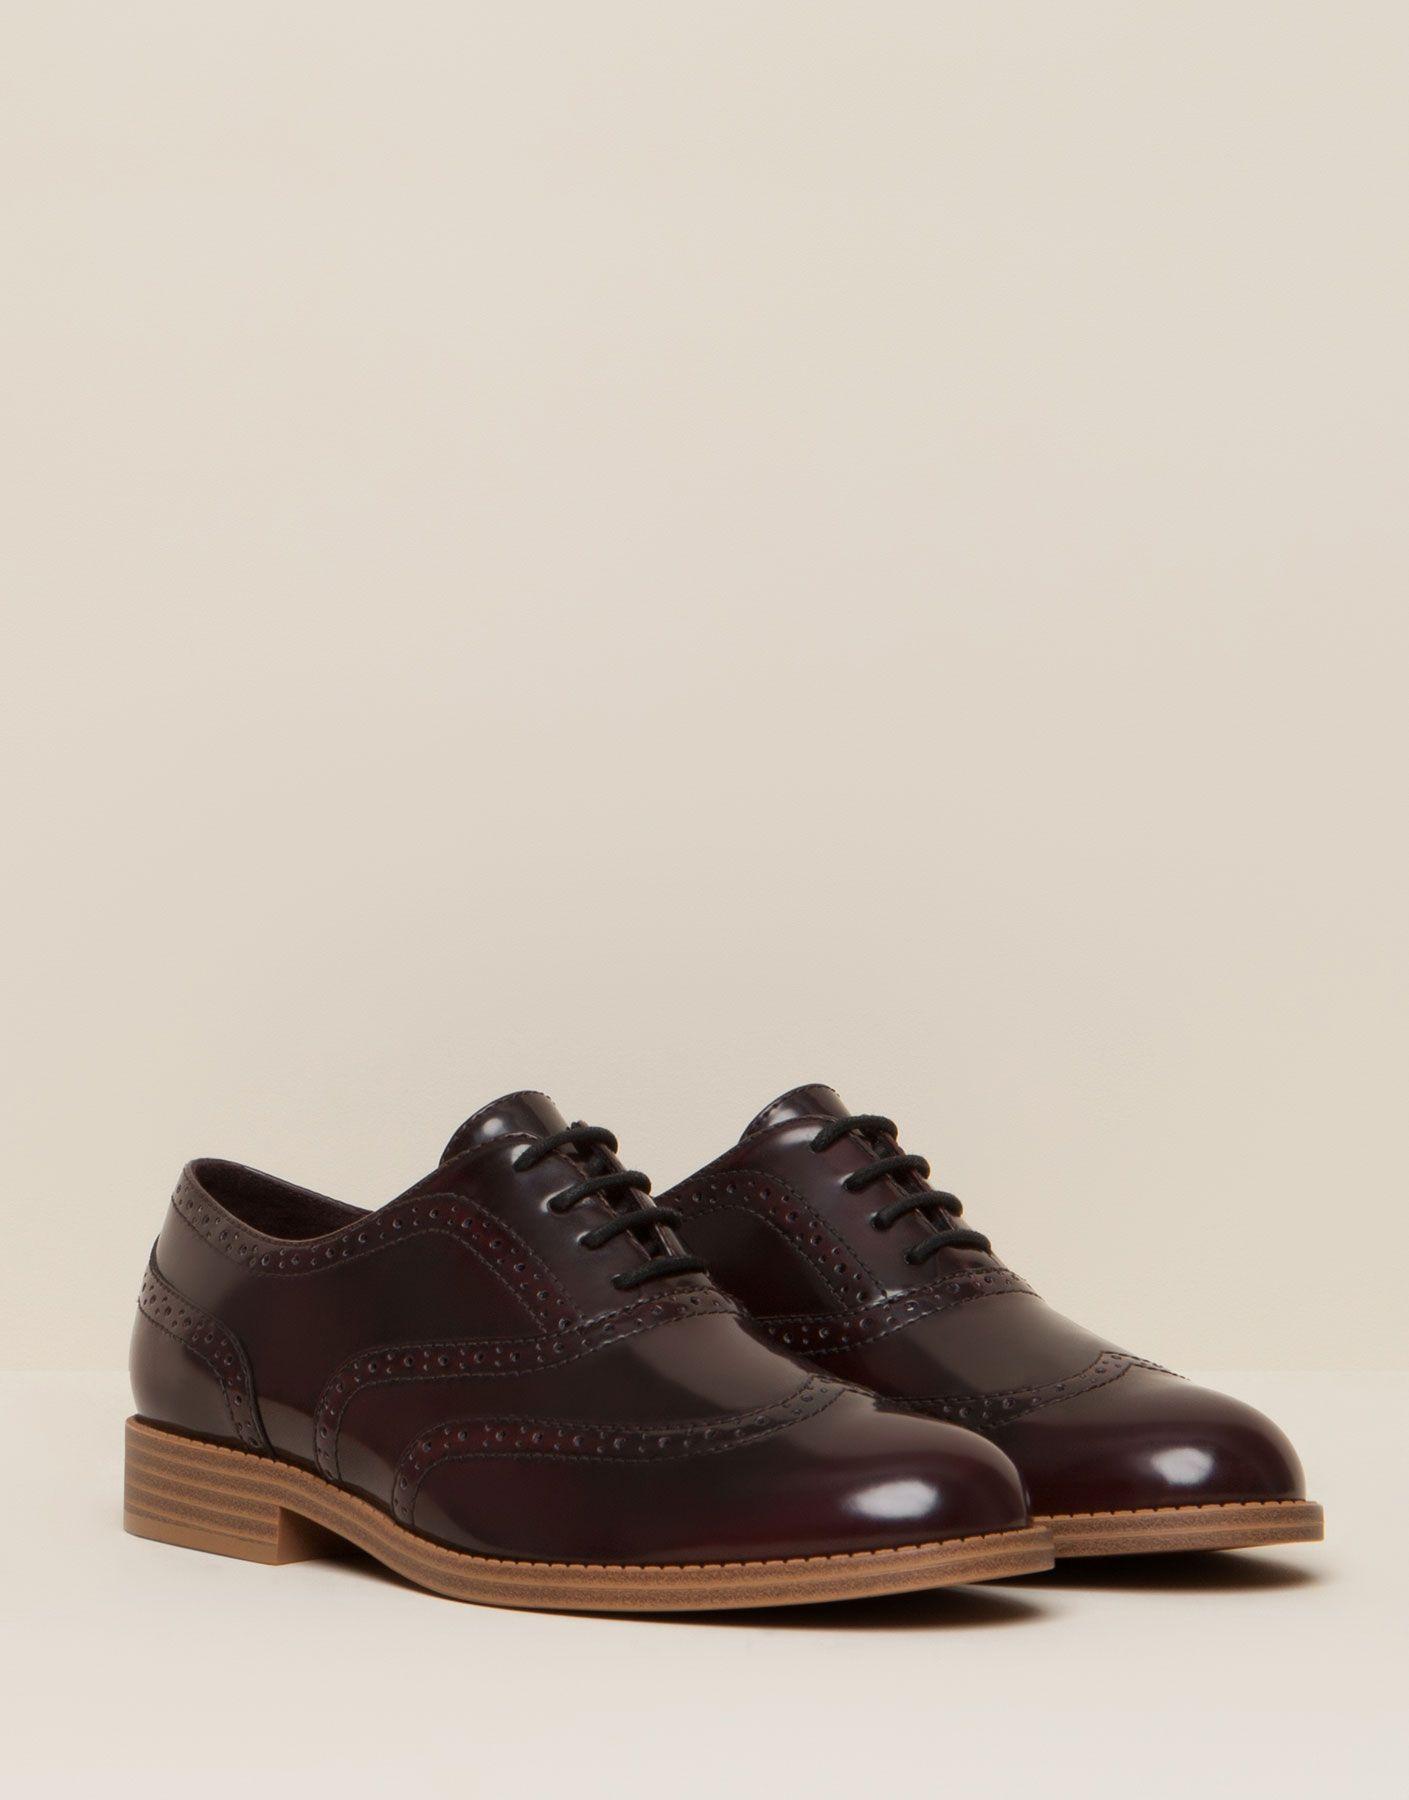 Blucher España amp;bear Pull Picados Shoes Zapatos Mujer pCBq1rnpxw